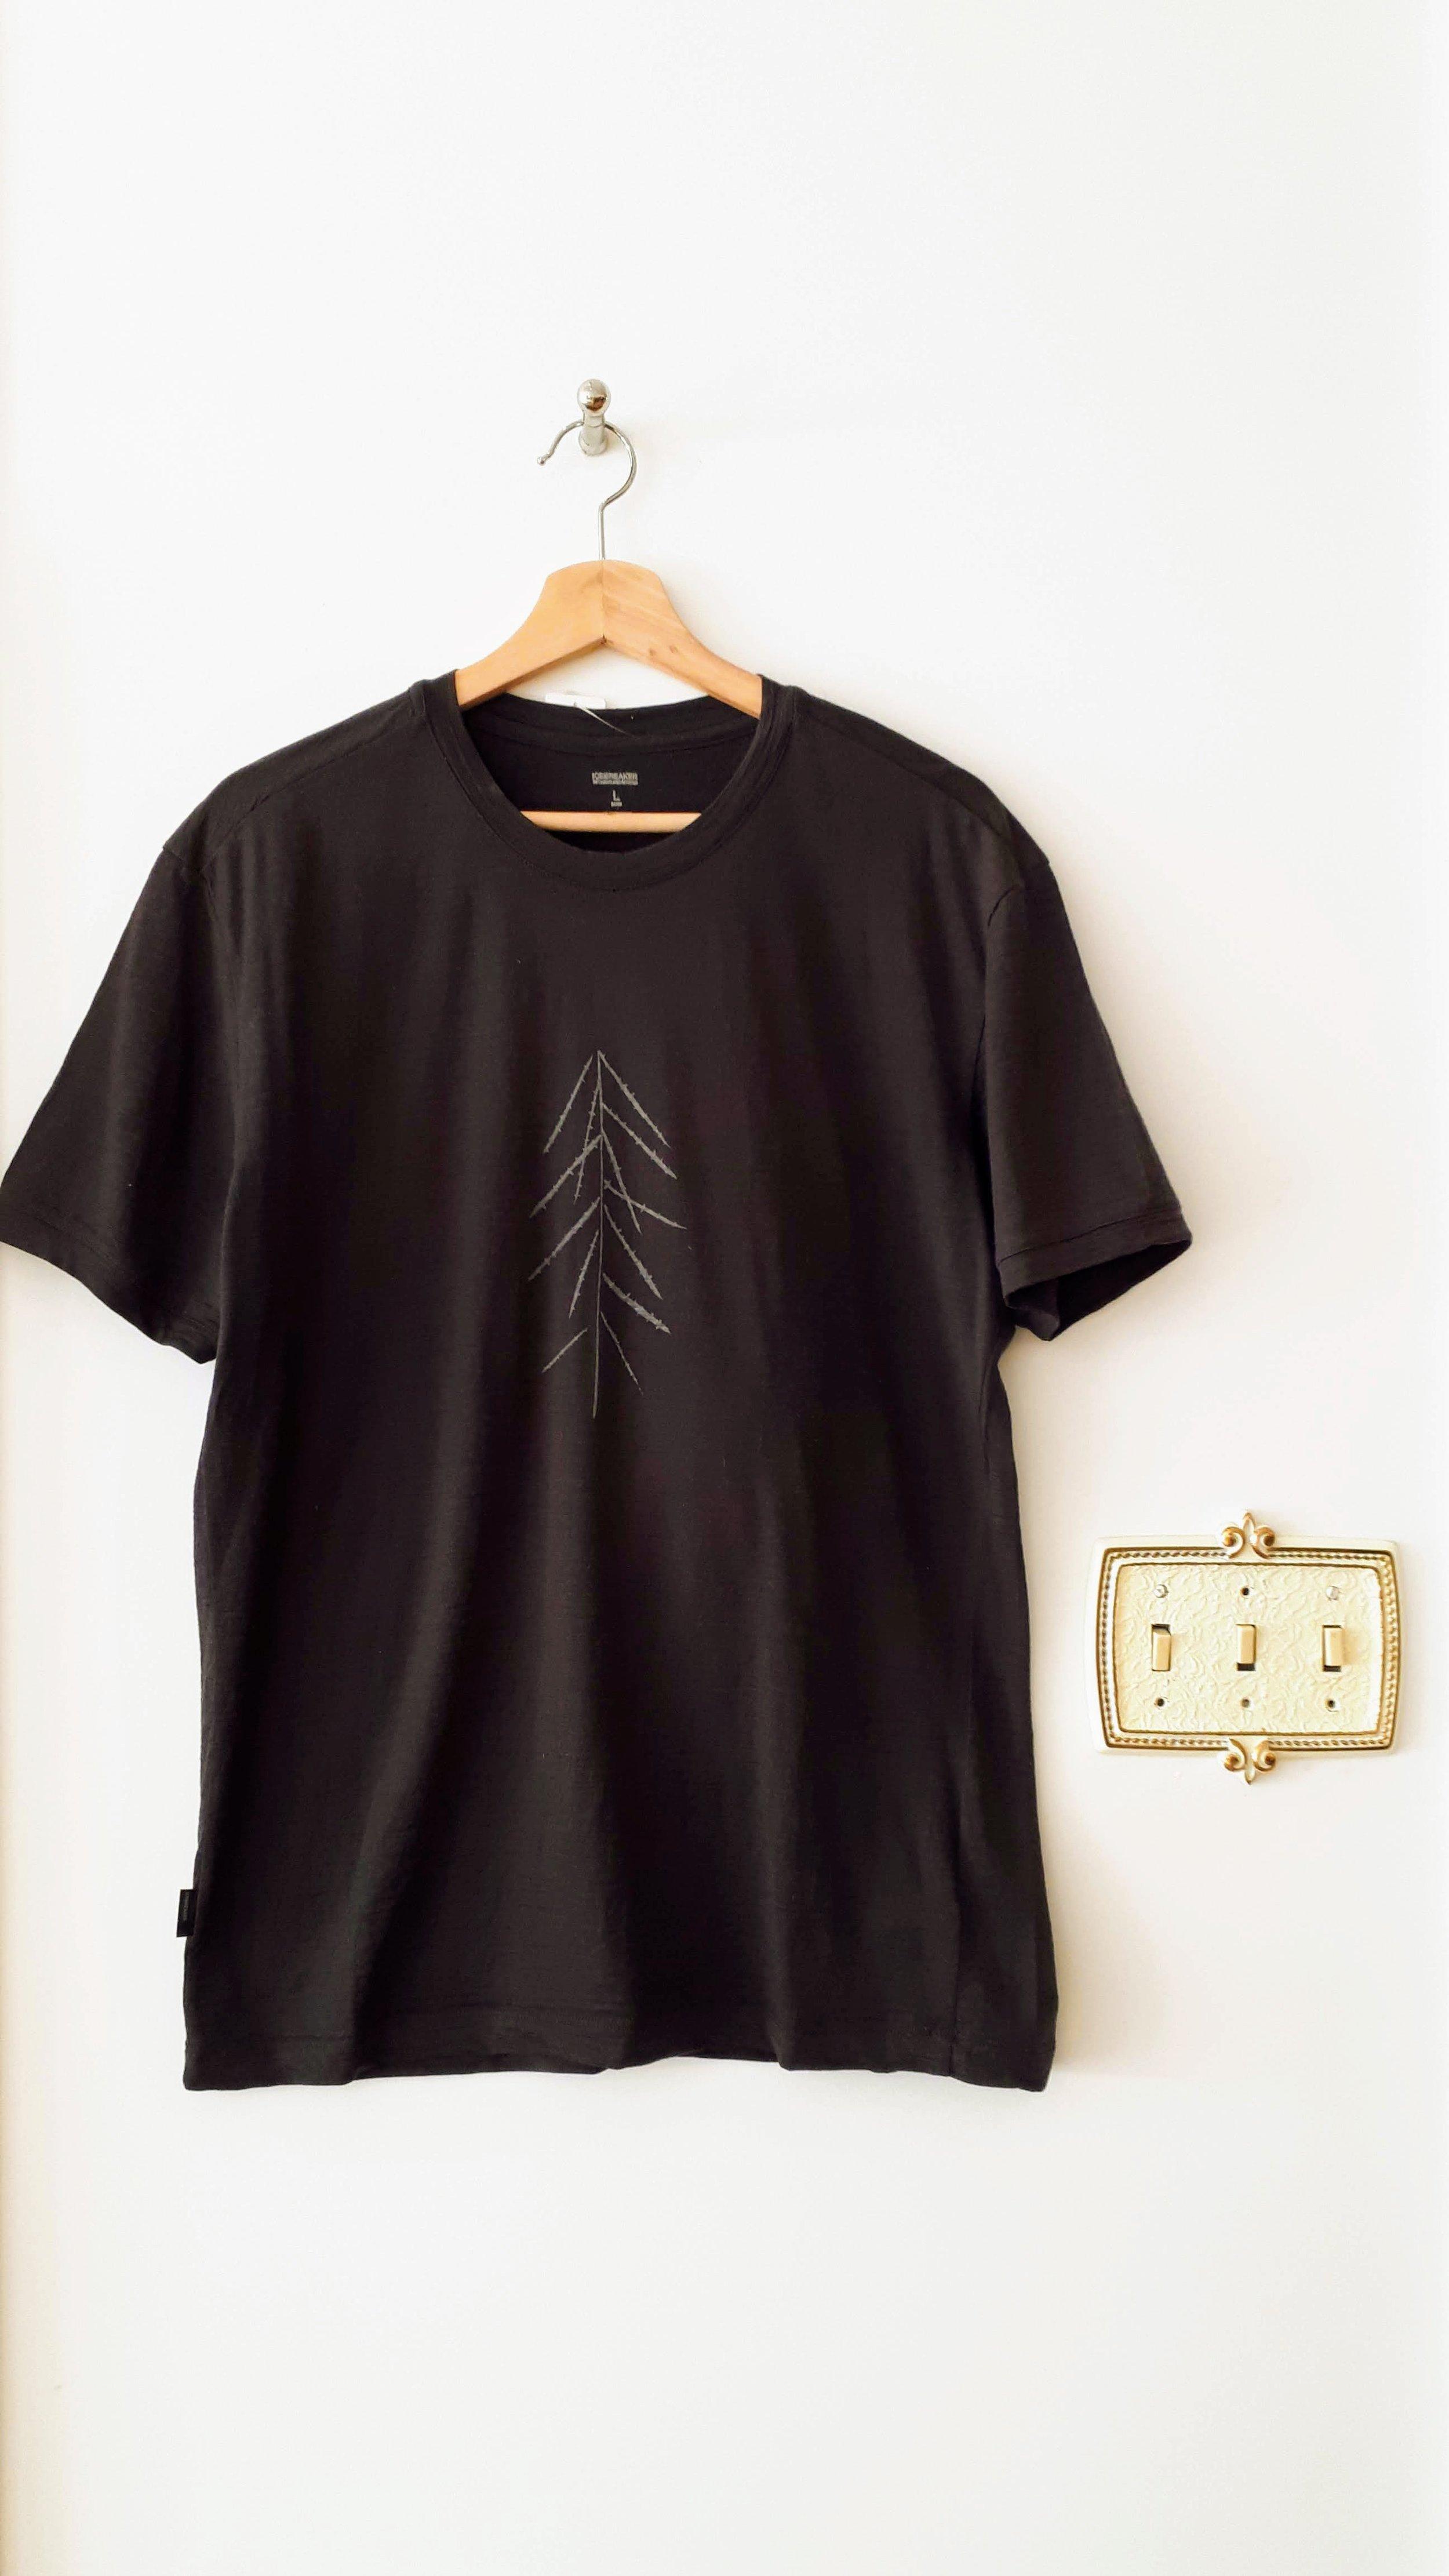 Mens Icebreaker shirt; Size L, $30